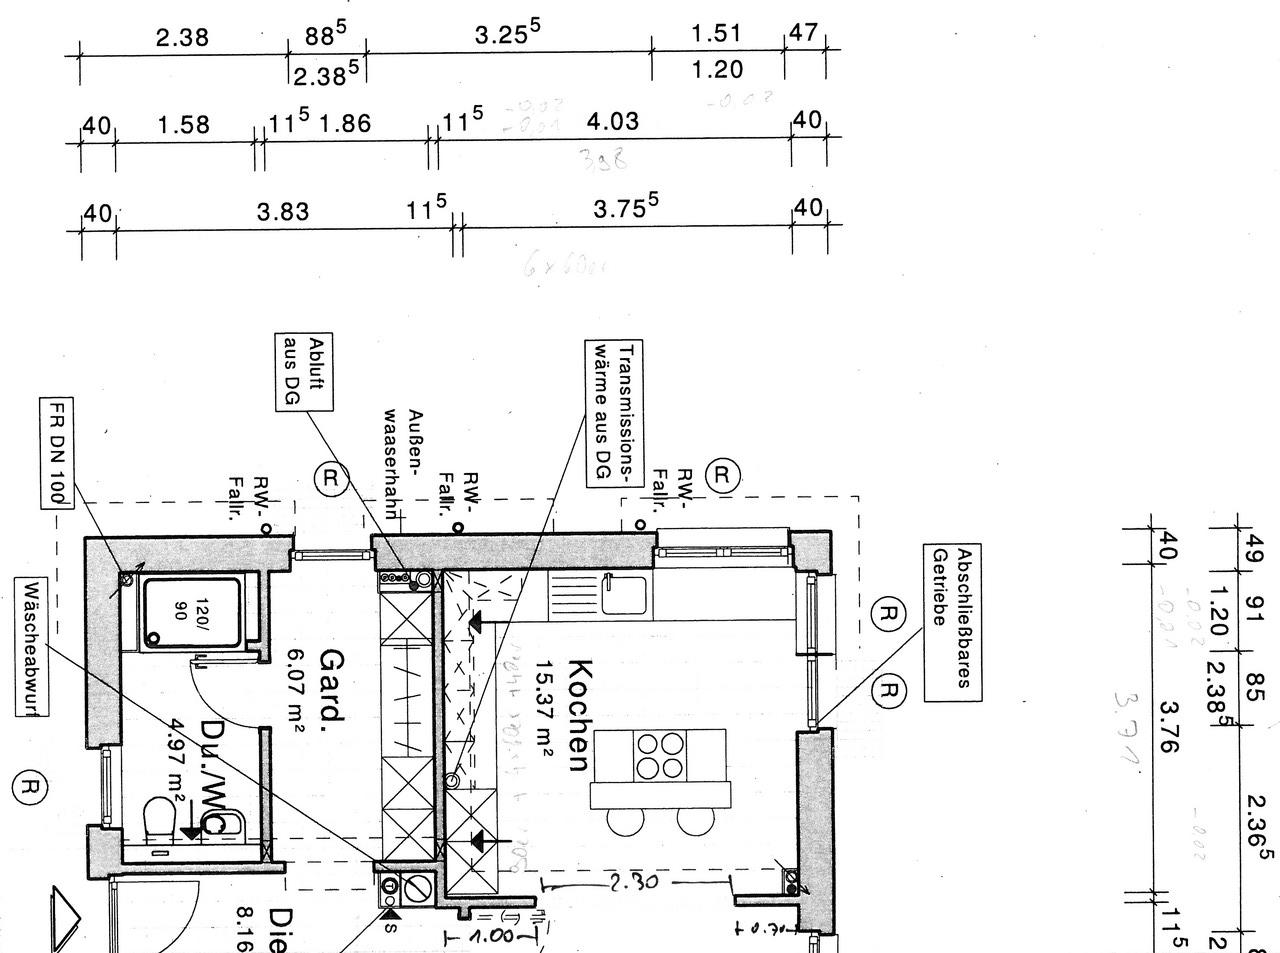 k che wir bauen 39 am lusthaus 39. Black Bedroom Furniture Sets. Home Design Ideas